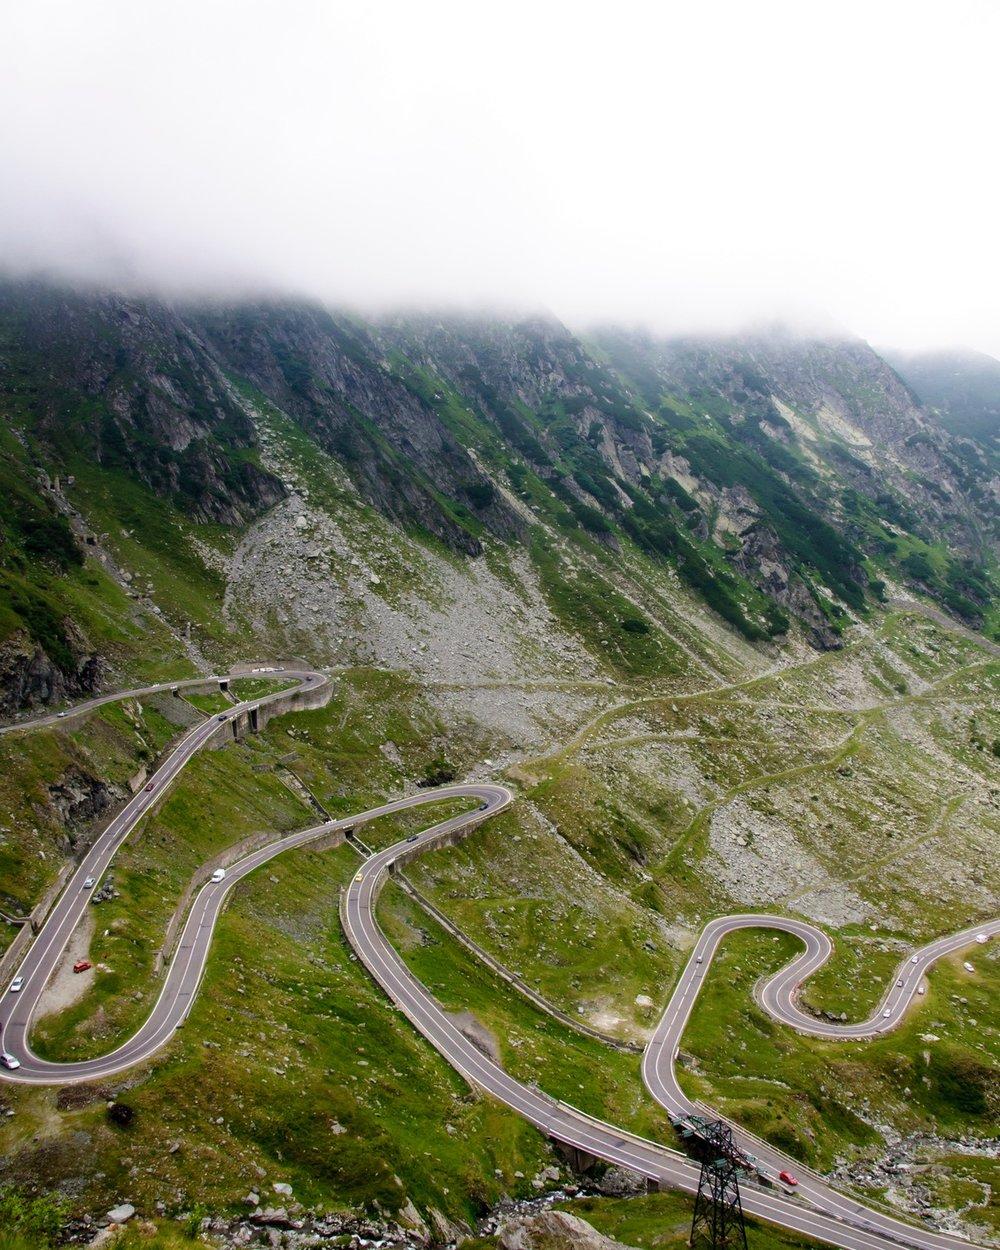 Cycling the Transfagarasan Highway. Copyright Martin Cycling Adventures.